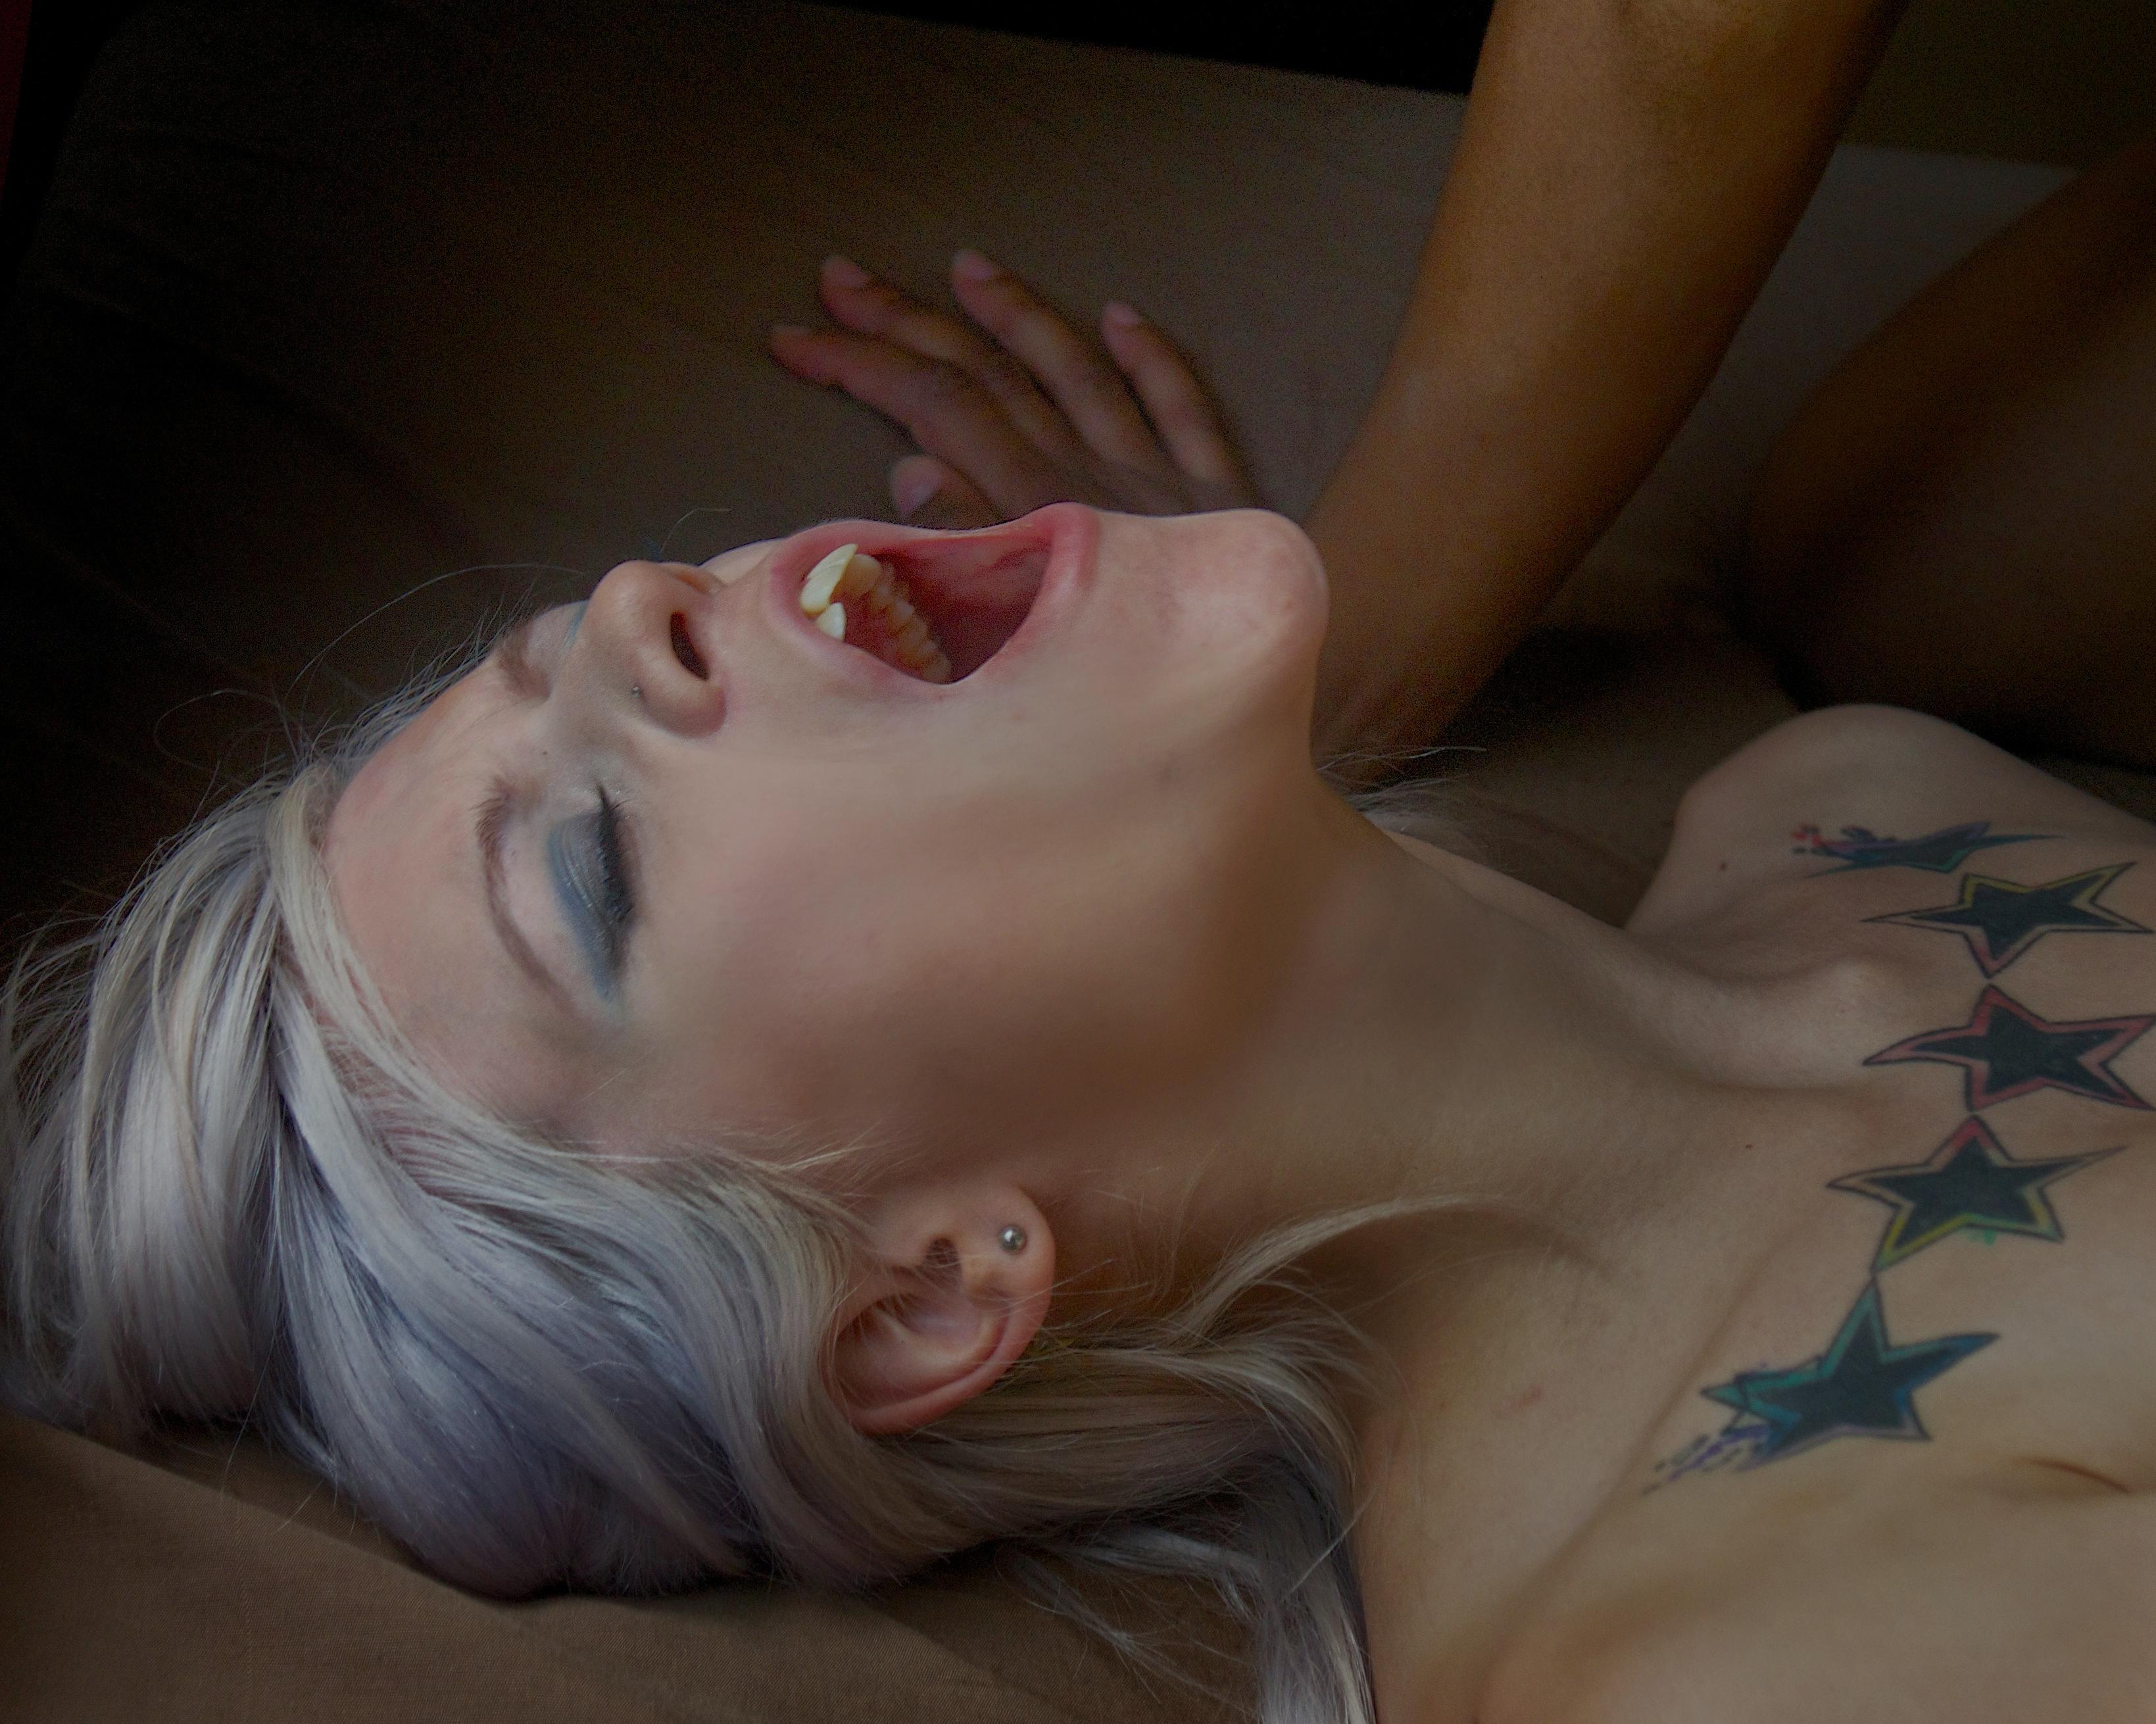 Woman experiencing pleasure